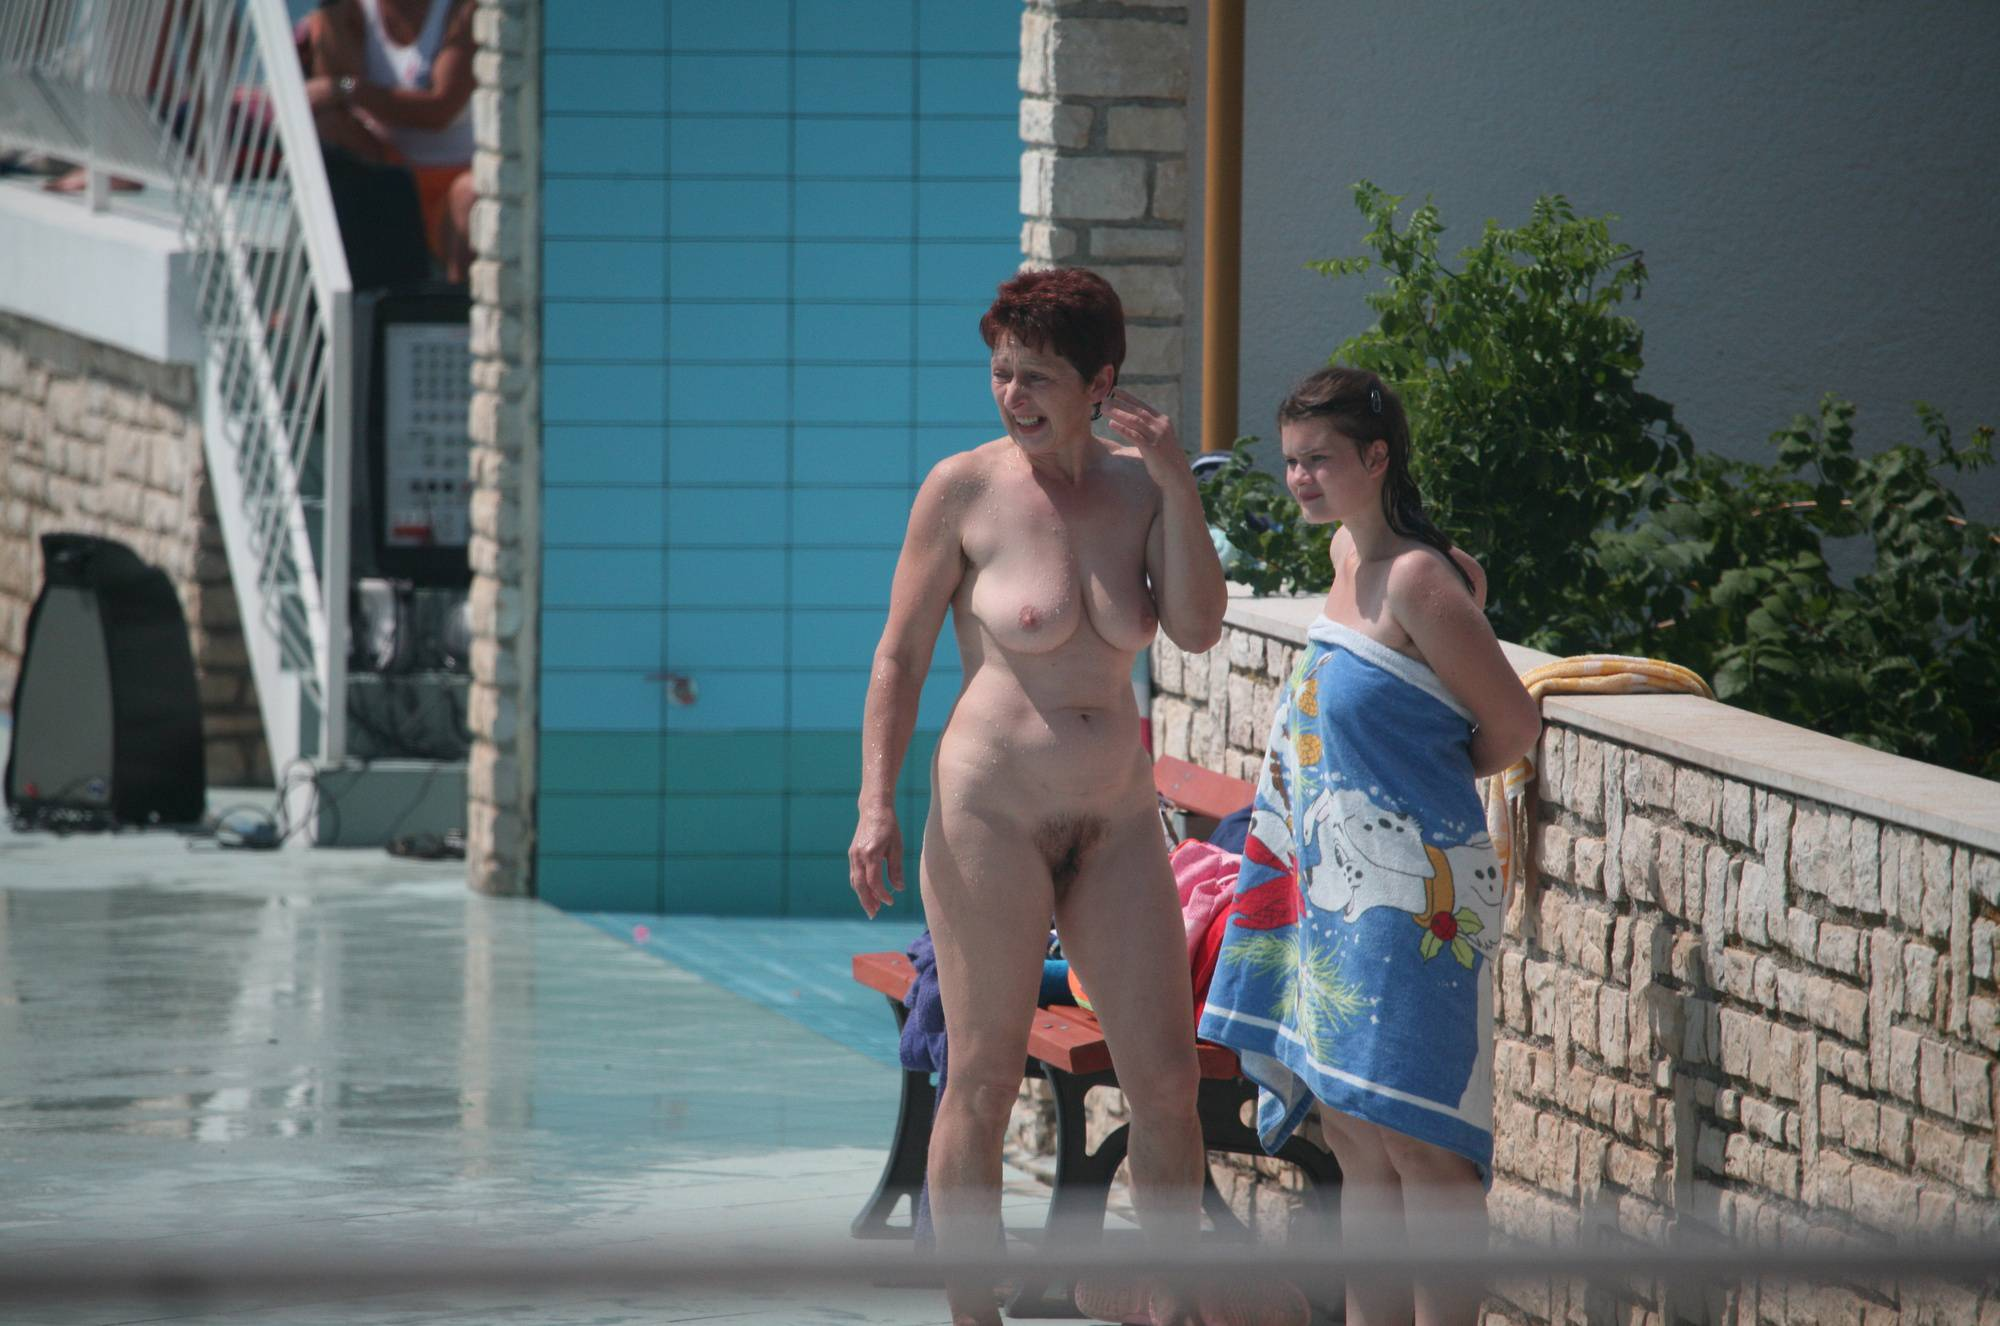 Nuda Inner Pool Activities - 1